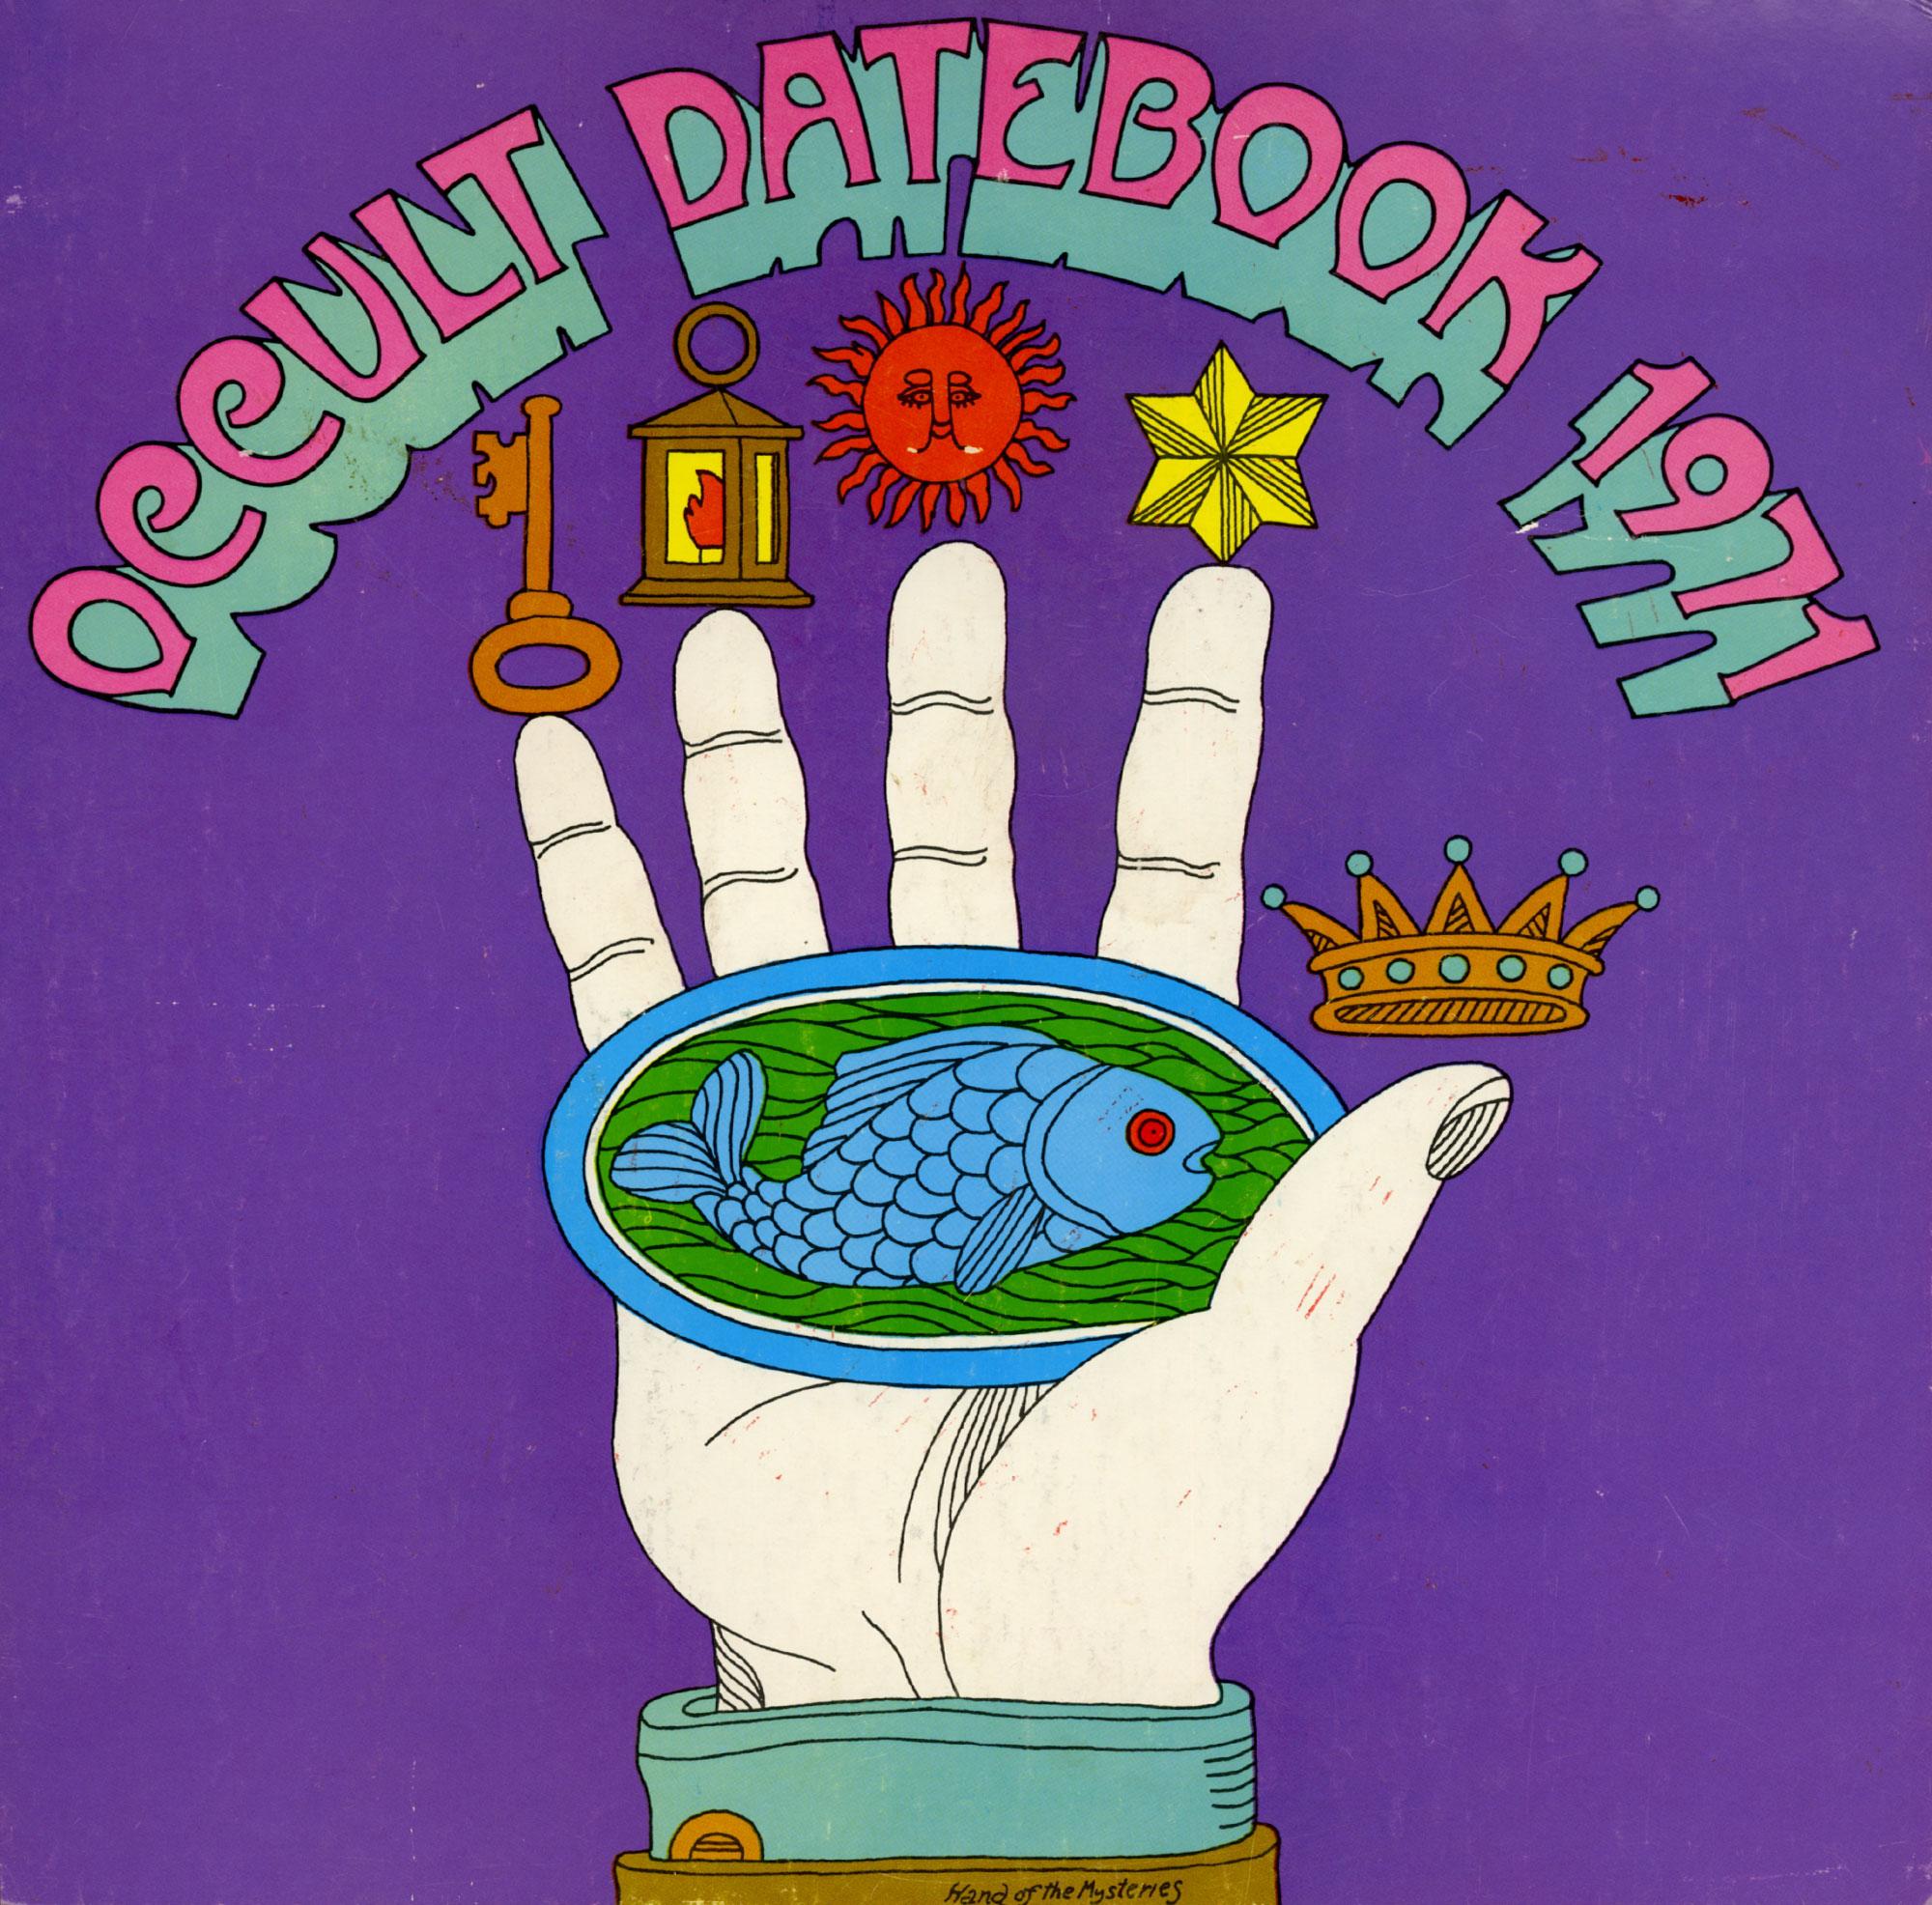 occult-datebook-COVER.jpg